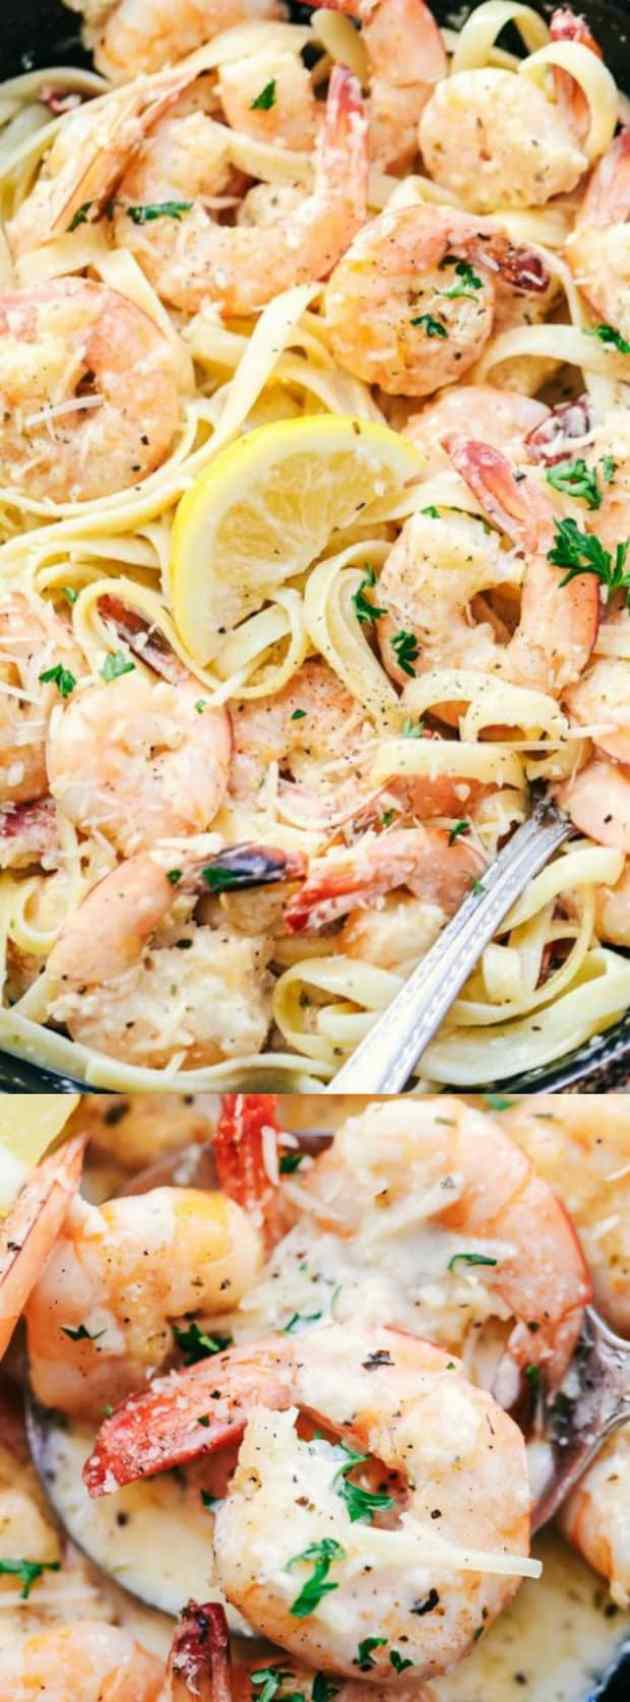 Creamy Parmesan Garlic Shrimp Pasta Longpin